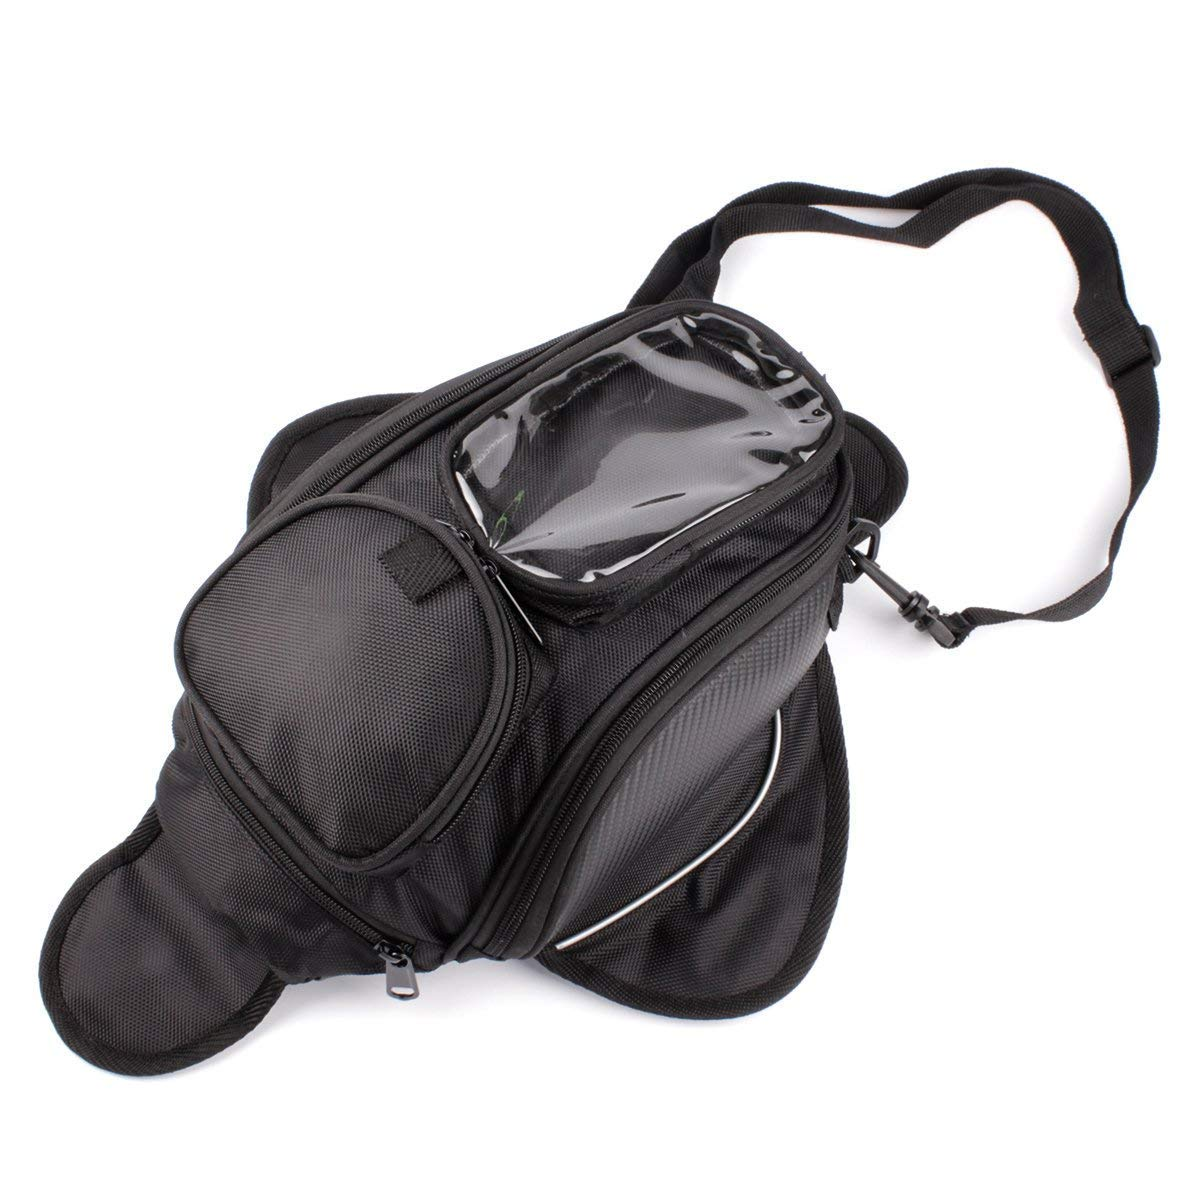 Motorcycle Gas Oil Fuel Tank Bag Waterproof Backpack & Magnetic Motorcycle Tank Bag for Honda Yamaha Suzuki Kawasaki by Remaiw moto